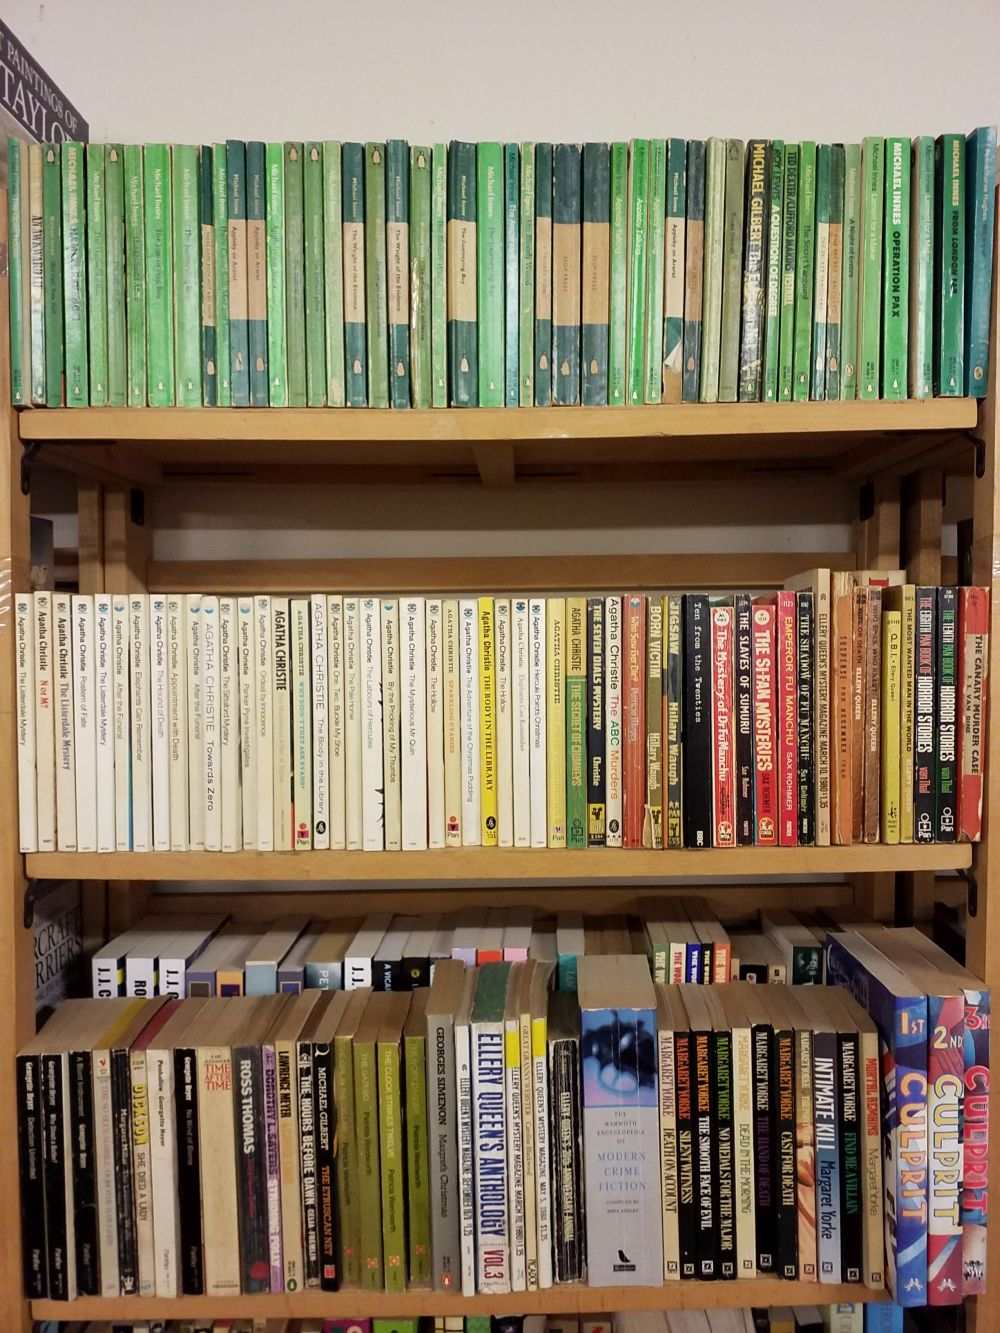 Crime Fiction. A large collection of crime fiction paperbacks